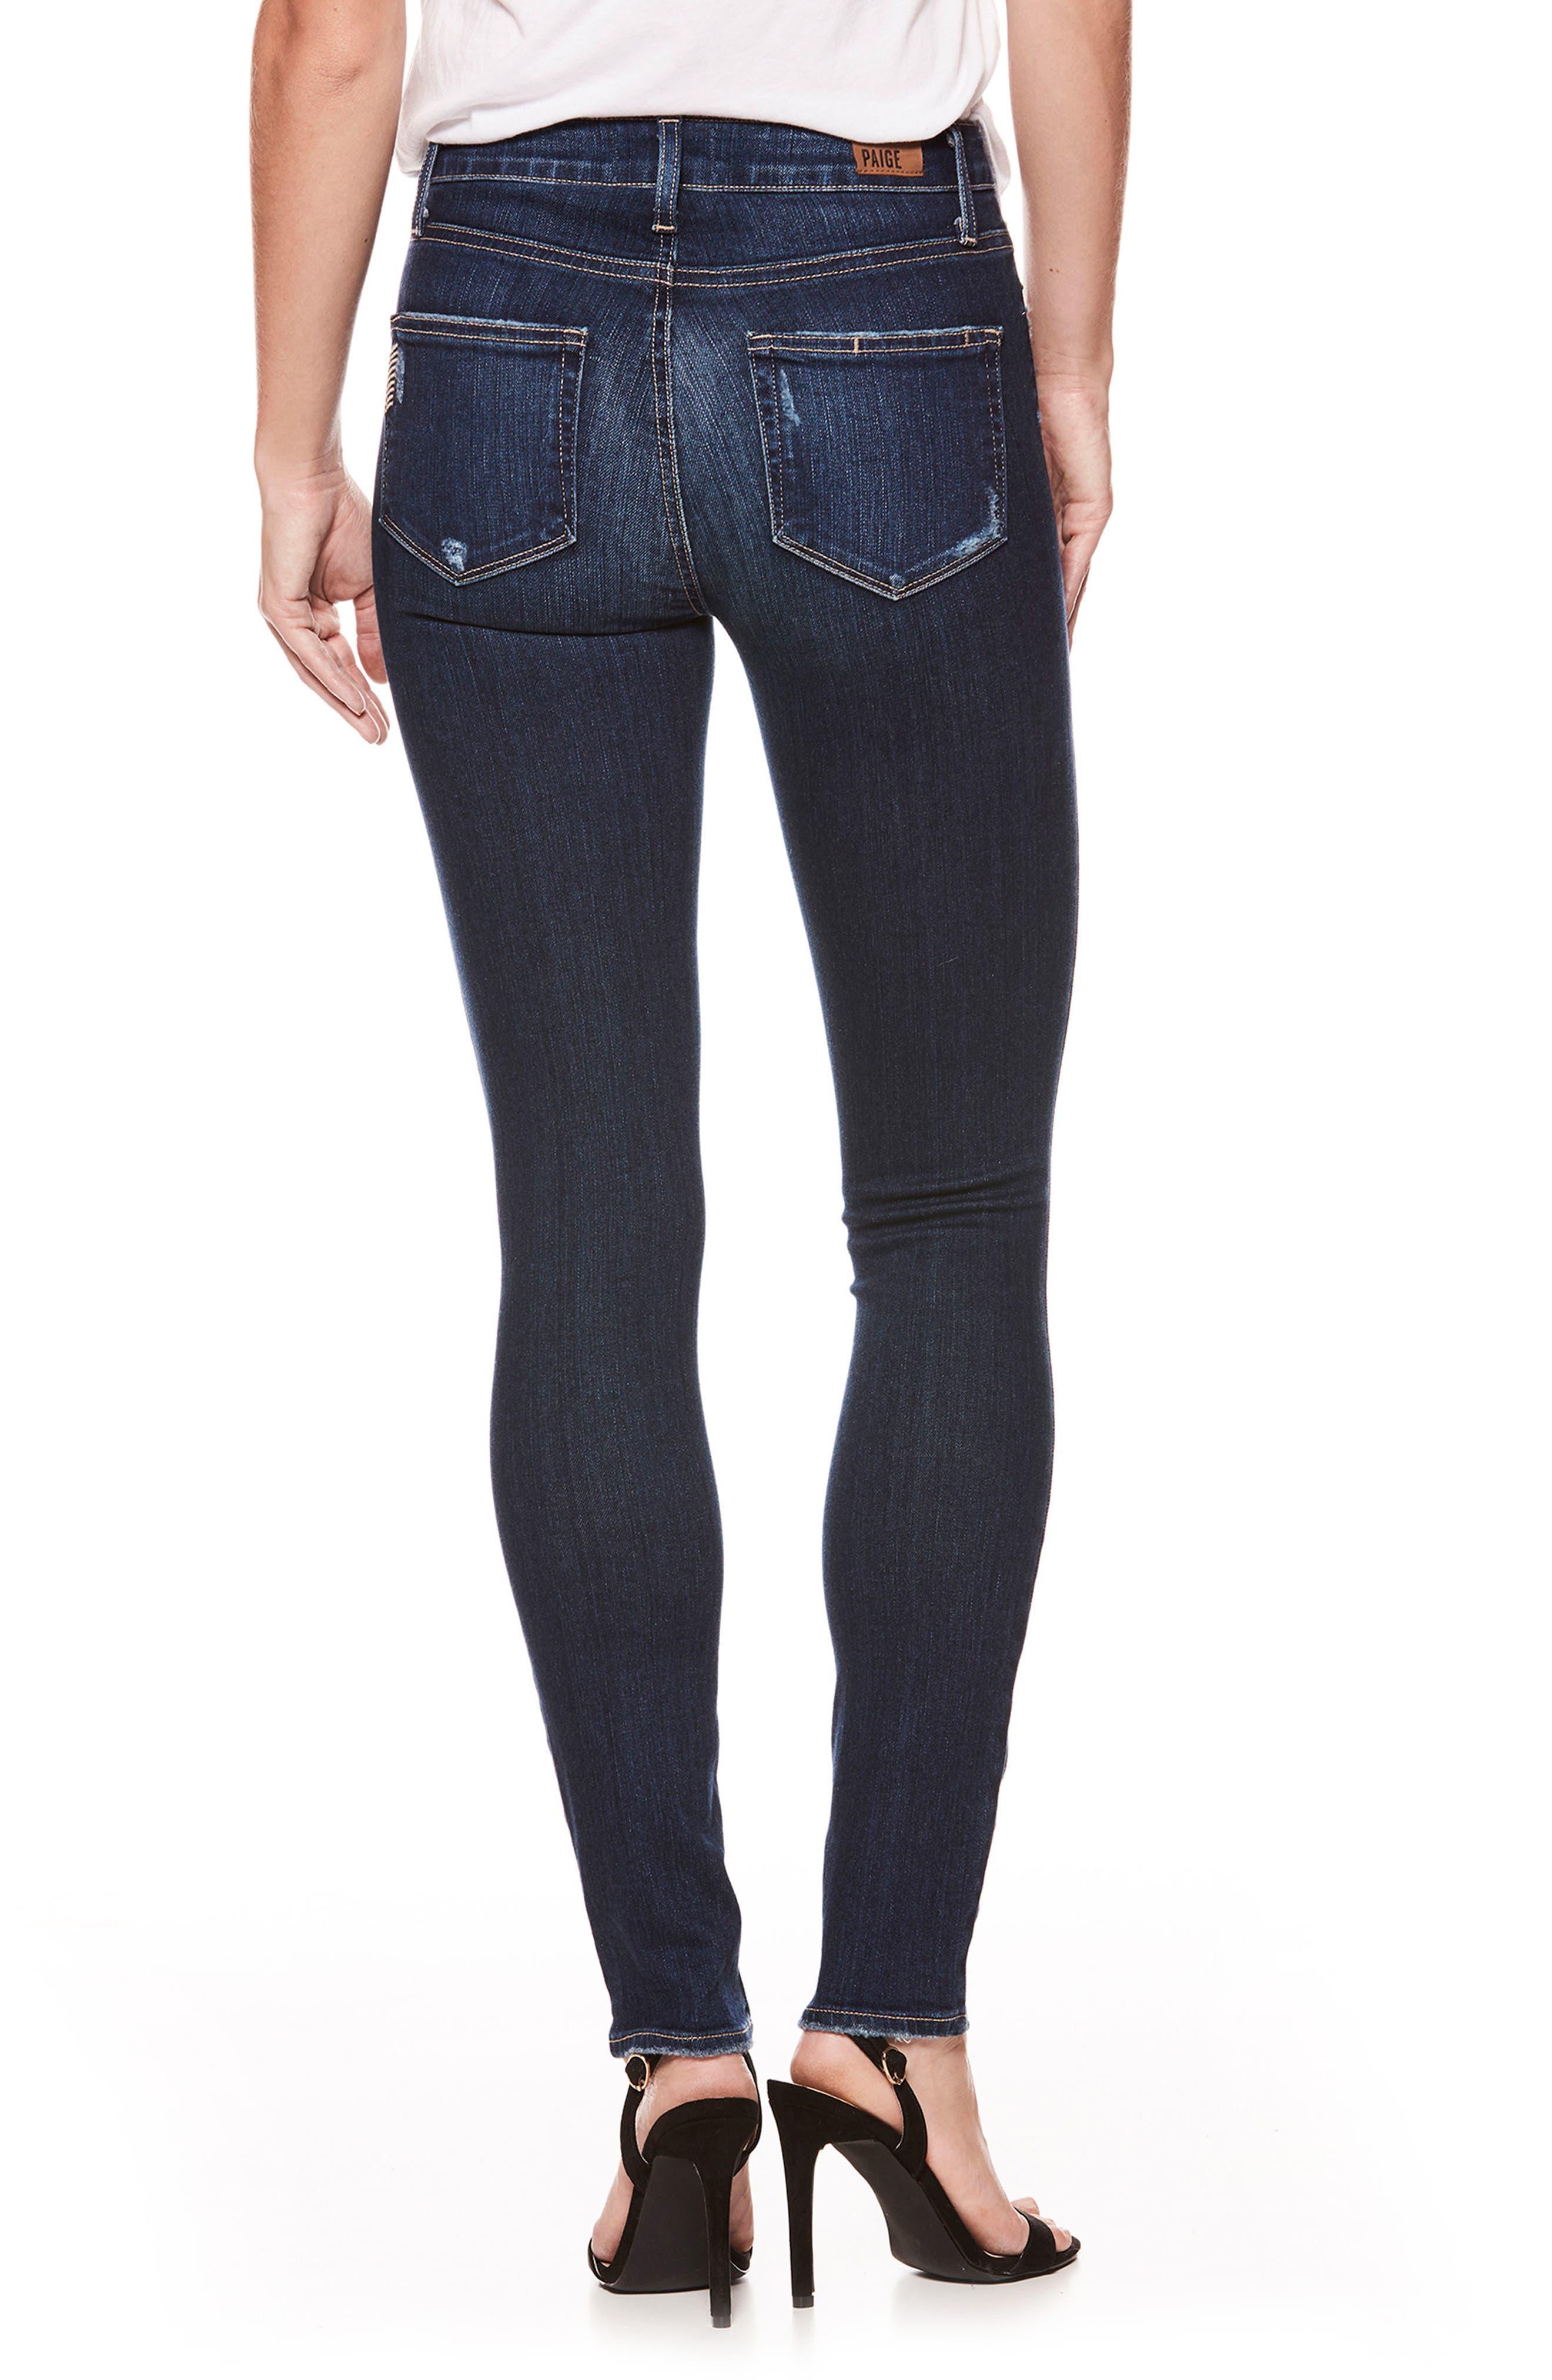 Hoxton High Waist Skinny Jeans,                             Alternate thumbnail 2, color,                             400